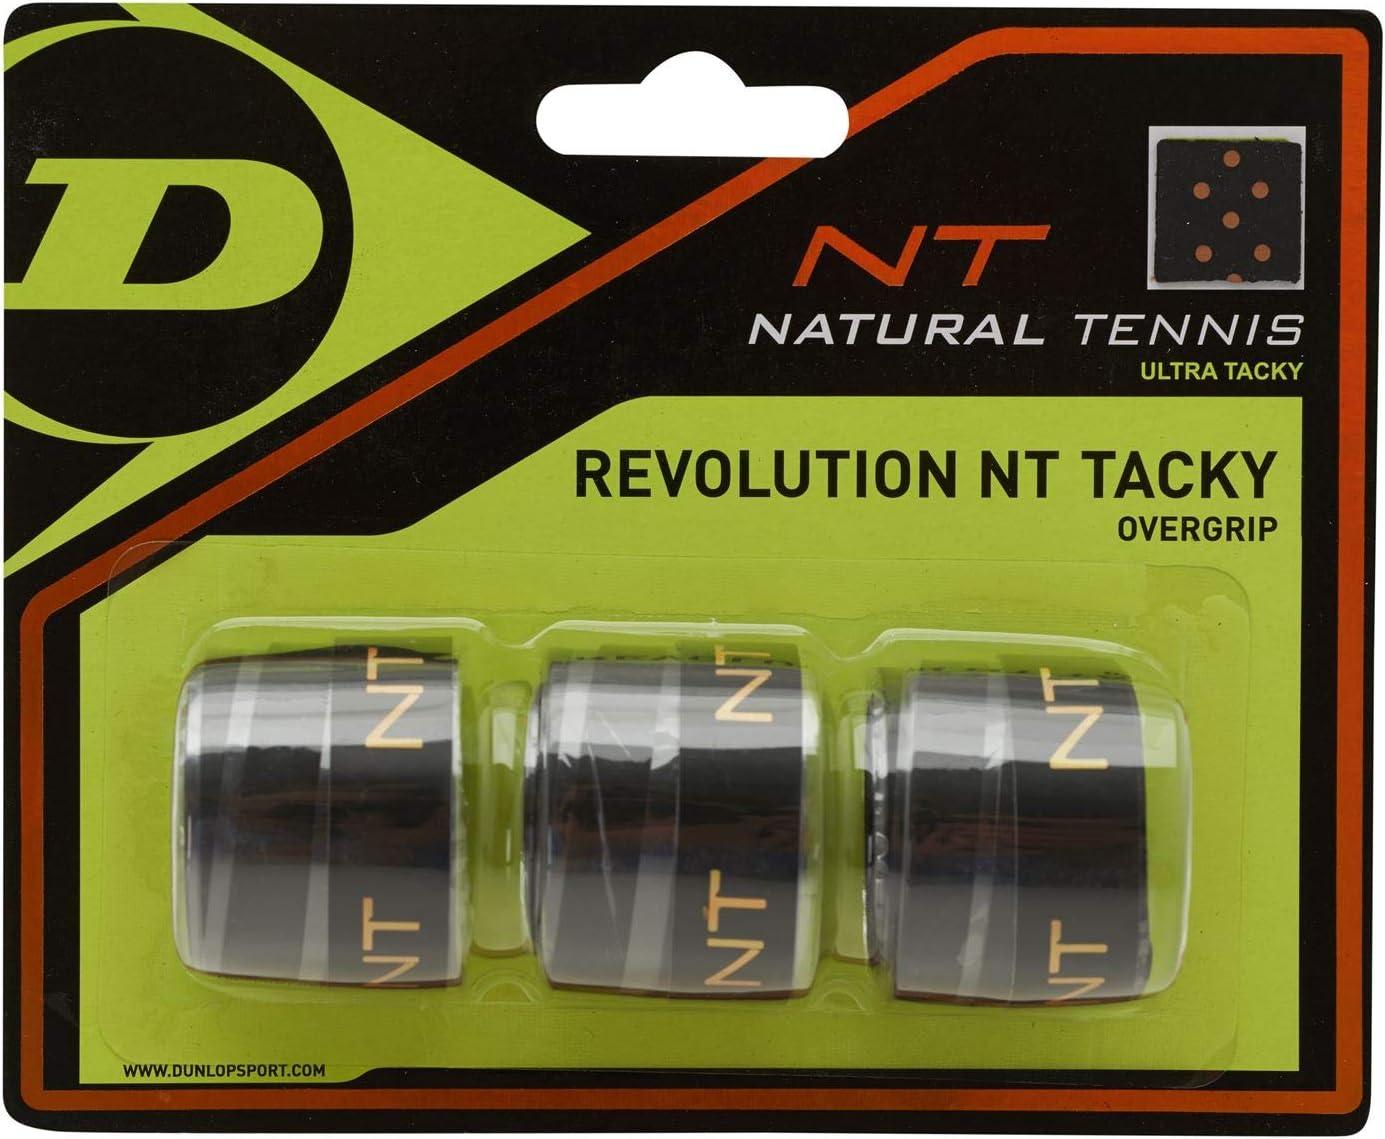 Dunlop Revolution NT Tacky Over Grip